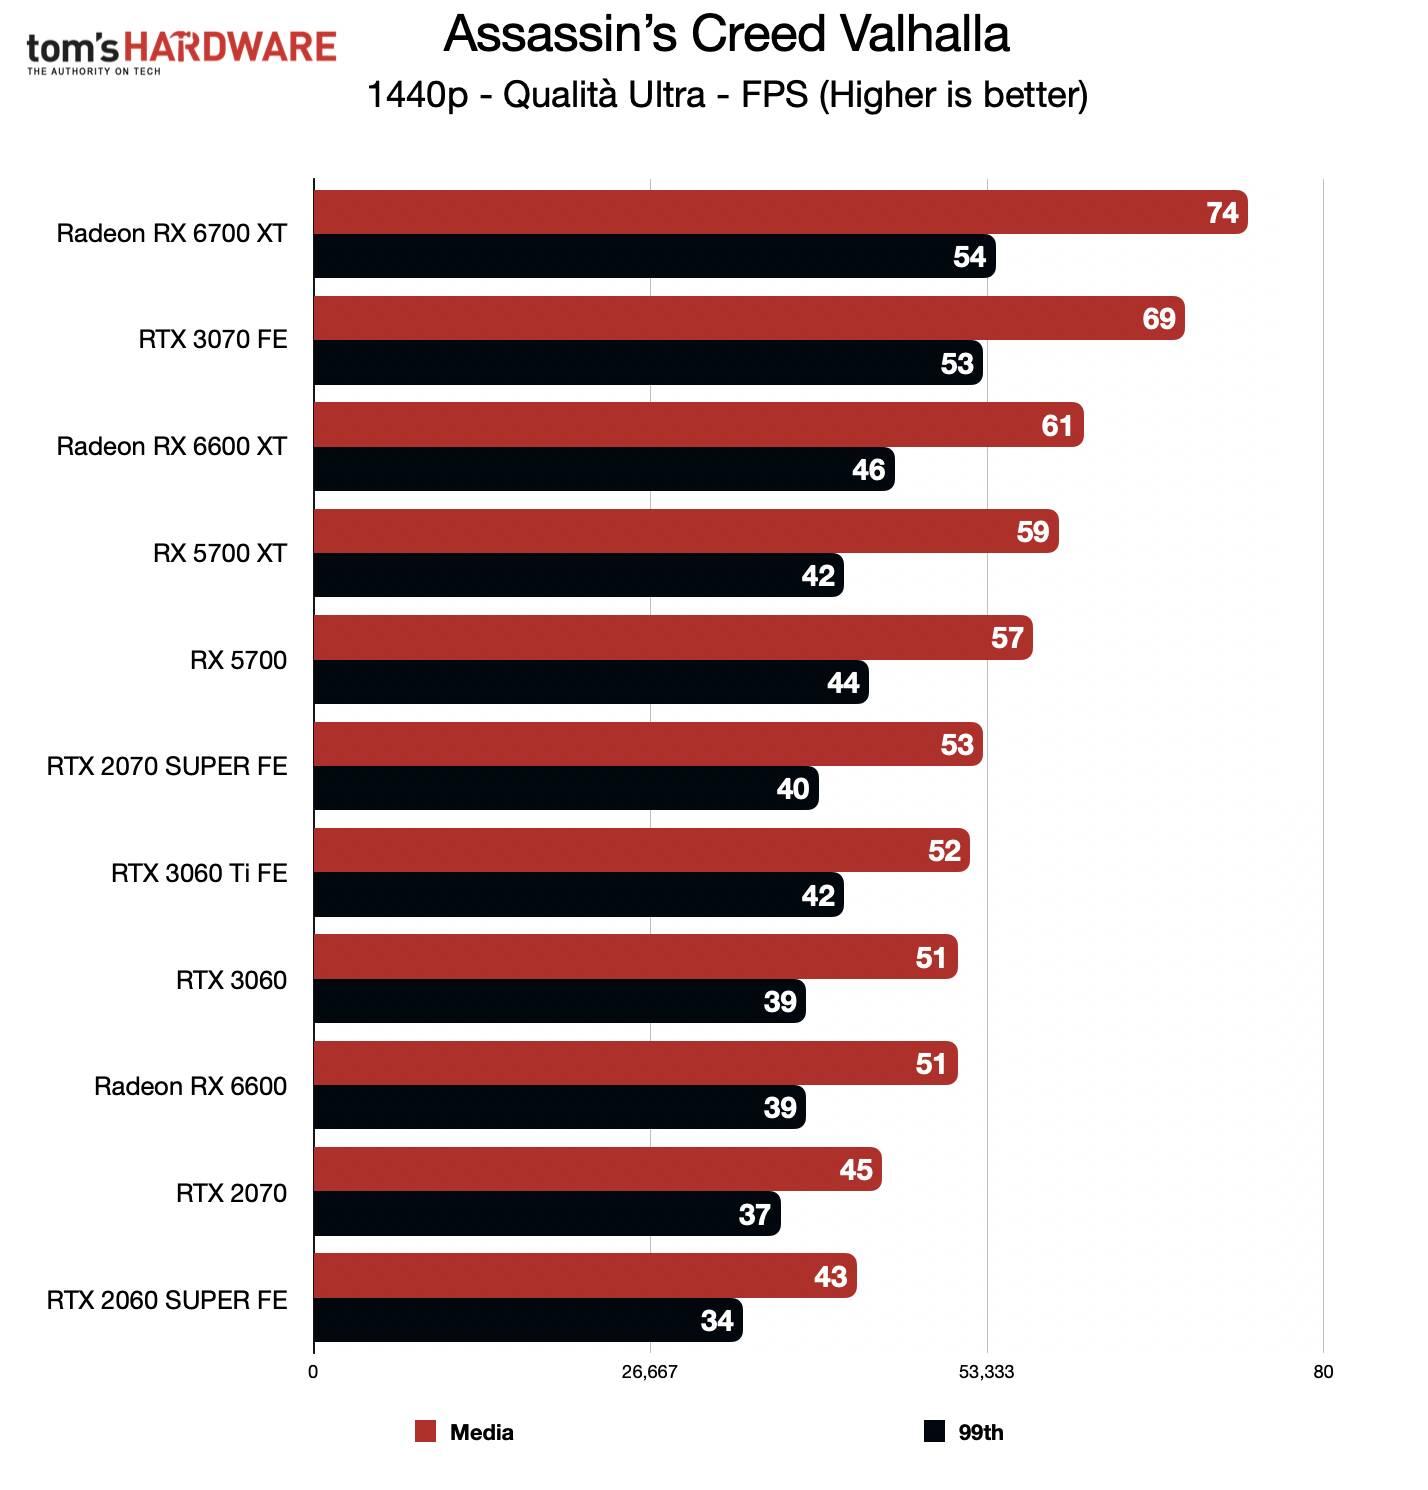 Benchmark Radeon RX 6600 - QHD - Assassin's Creed Valhalla